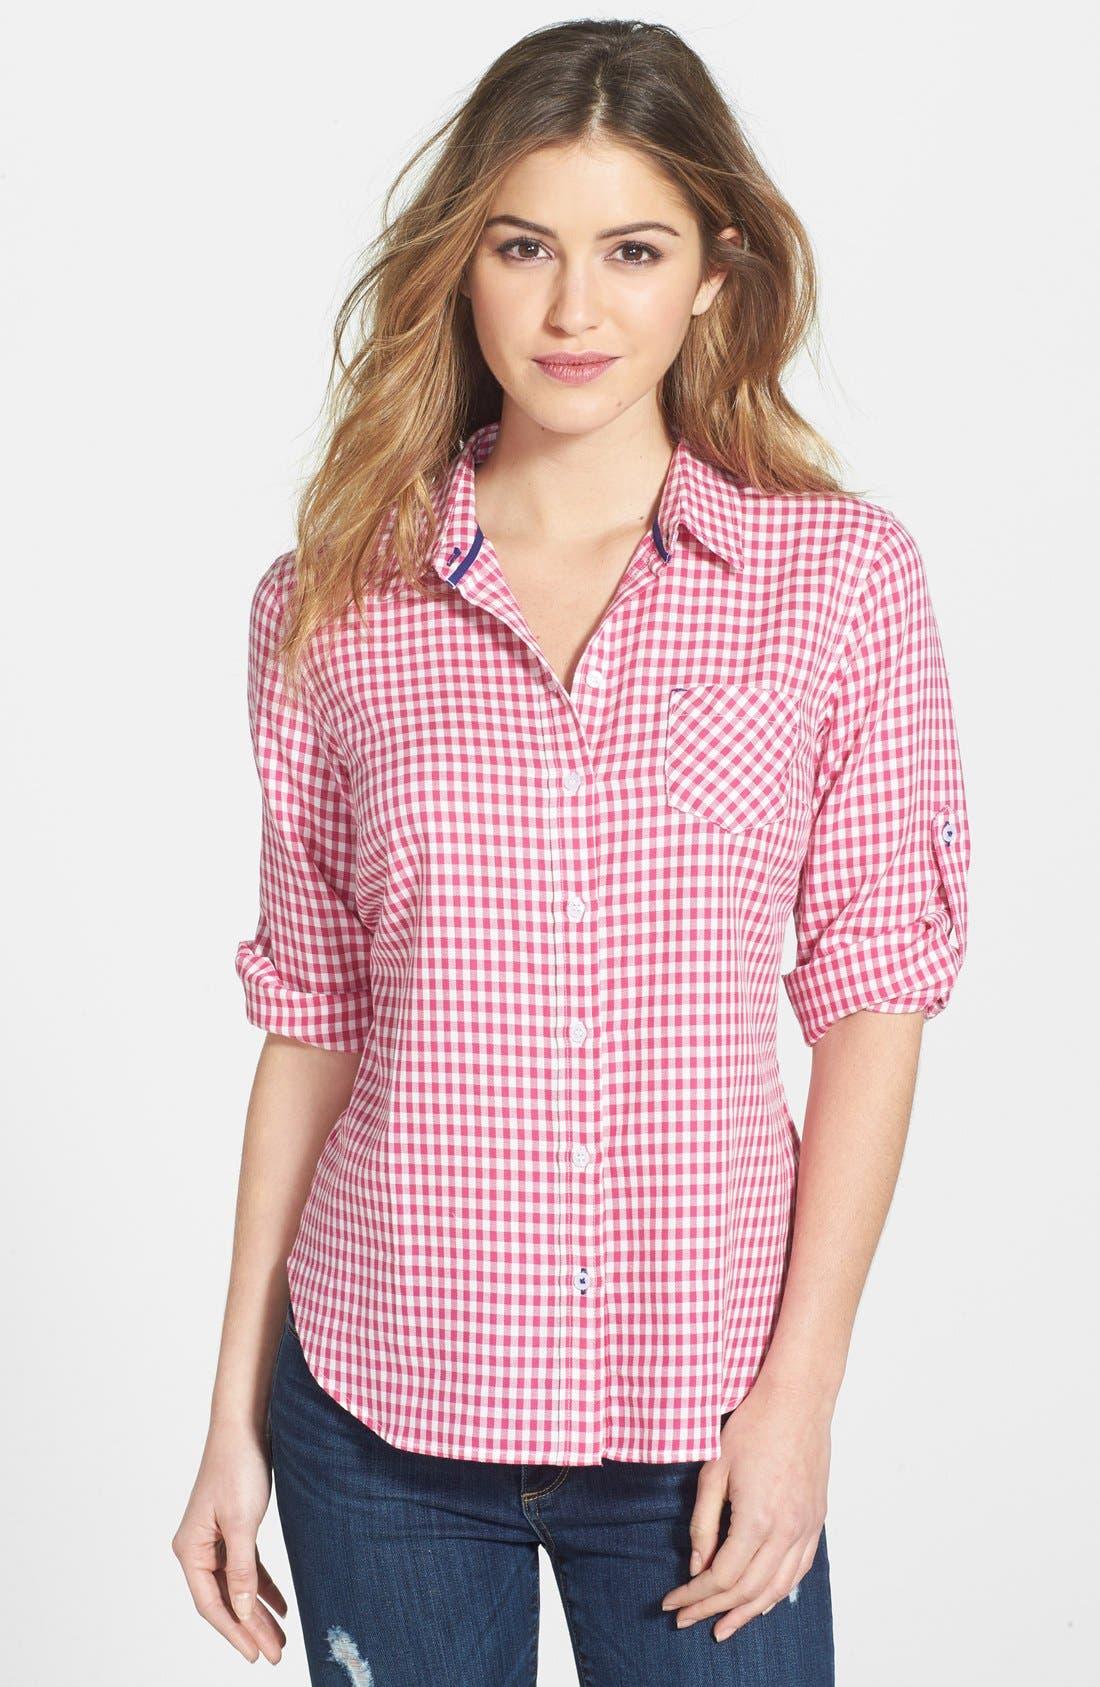 Alternate Image 1 Selected - Sandra Ingrish Mini Gingham Twill Shirt (Regular & Sale)